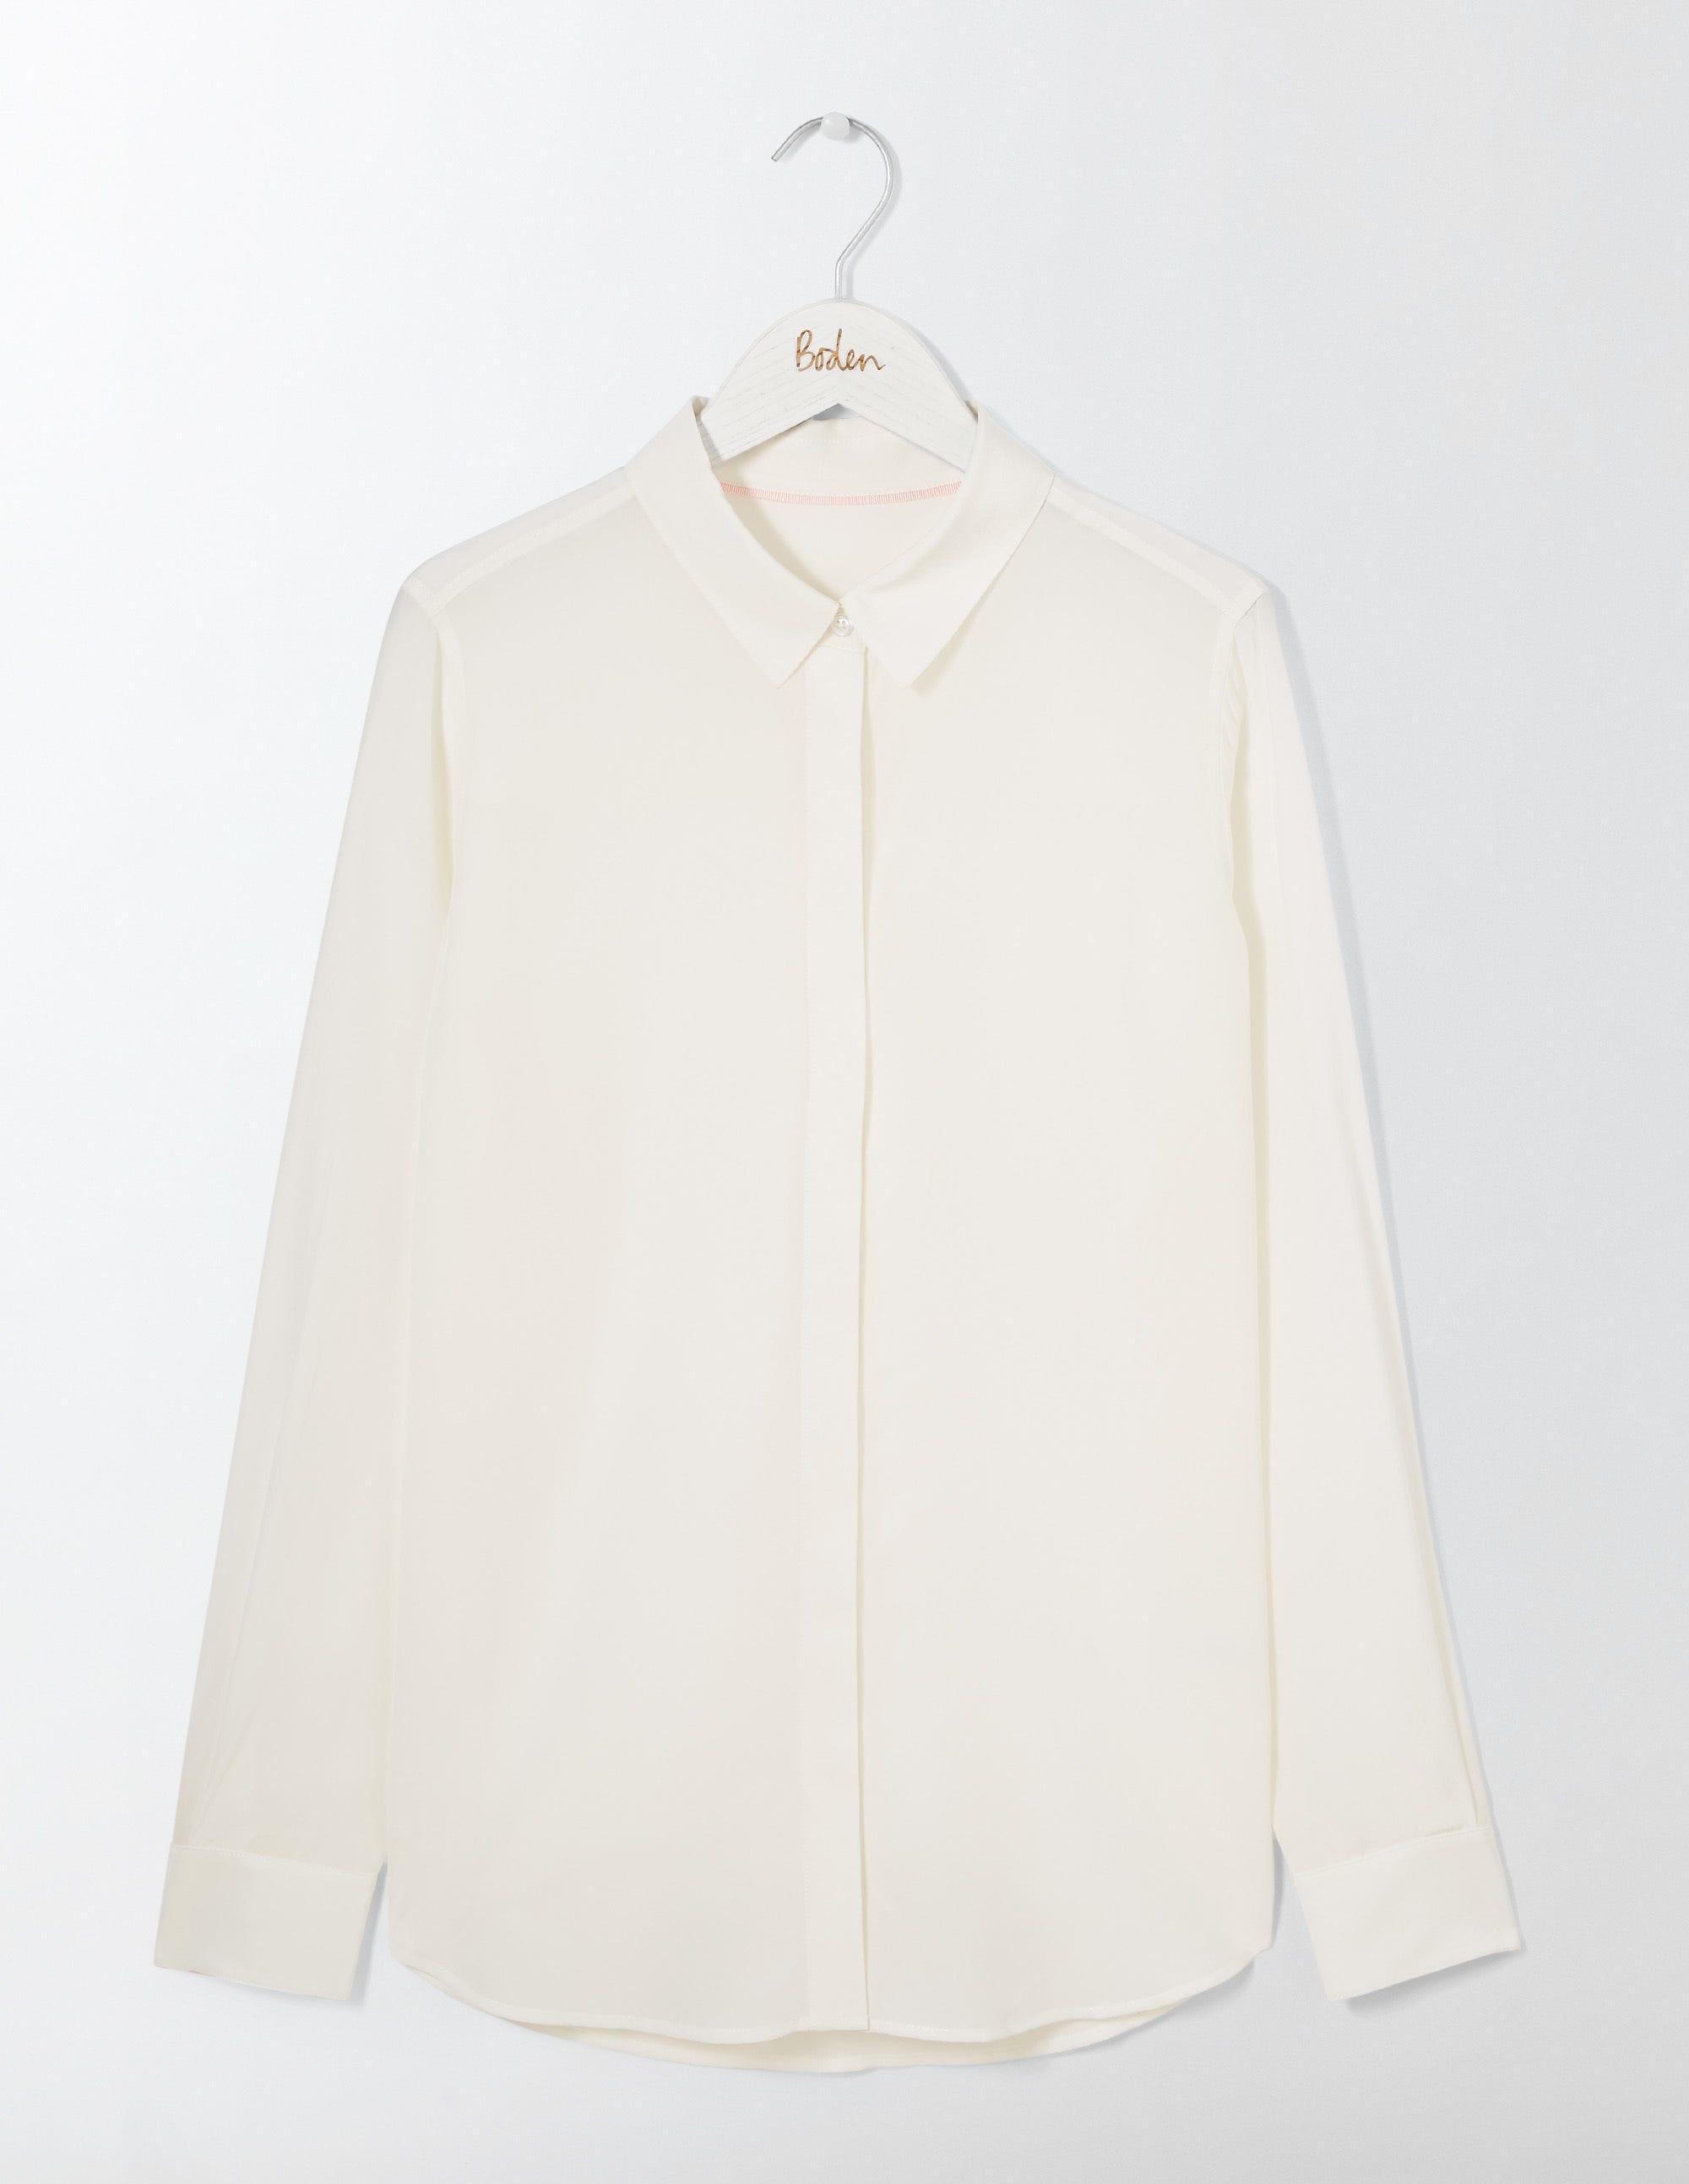 La chemise en soie Ivory Femme Boden